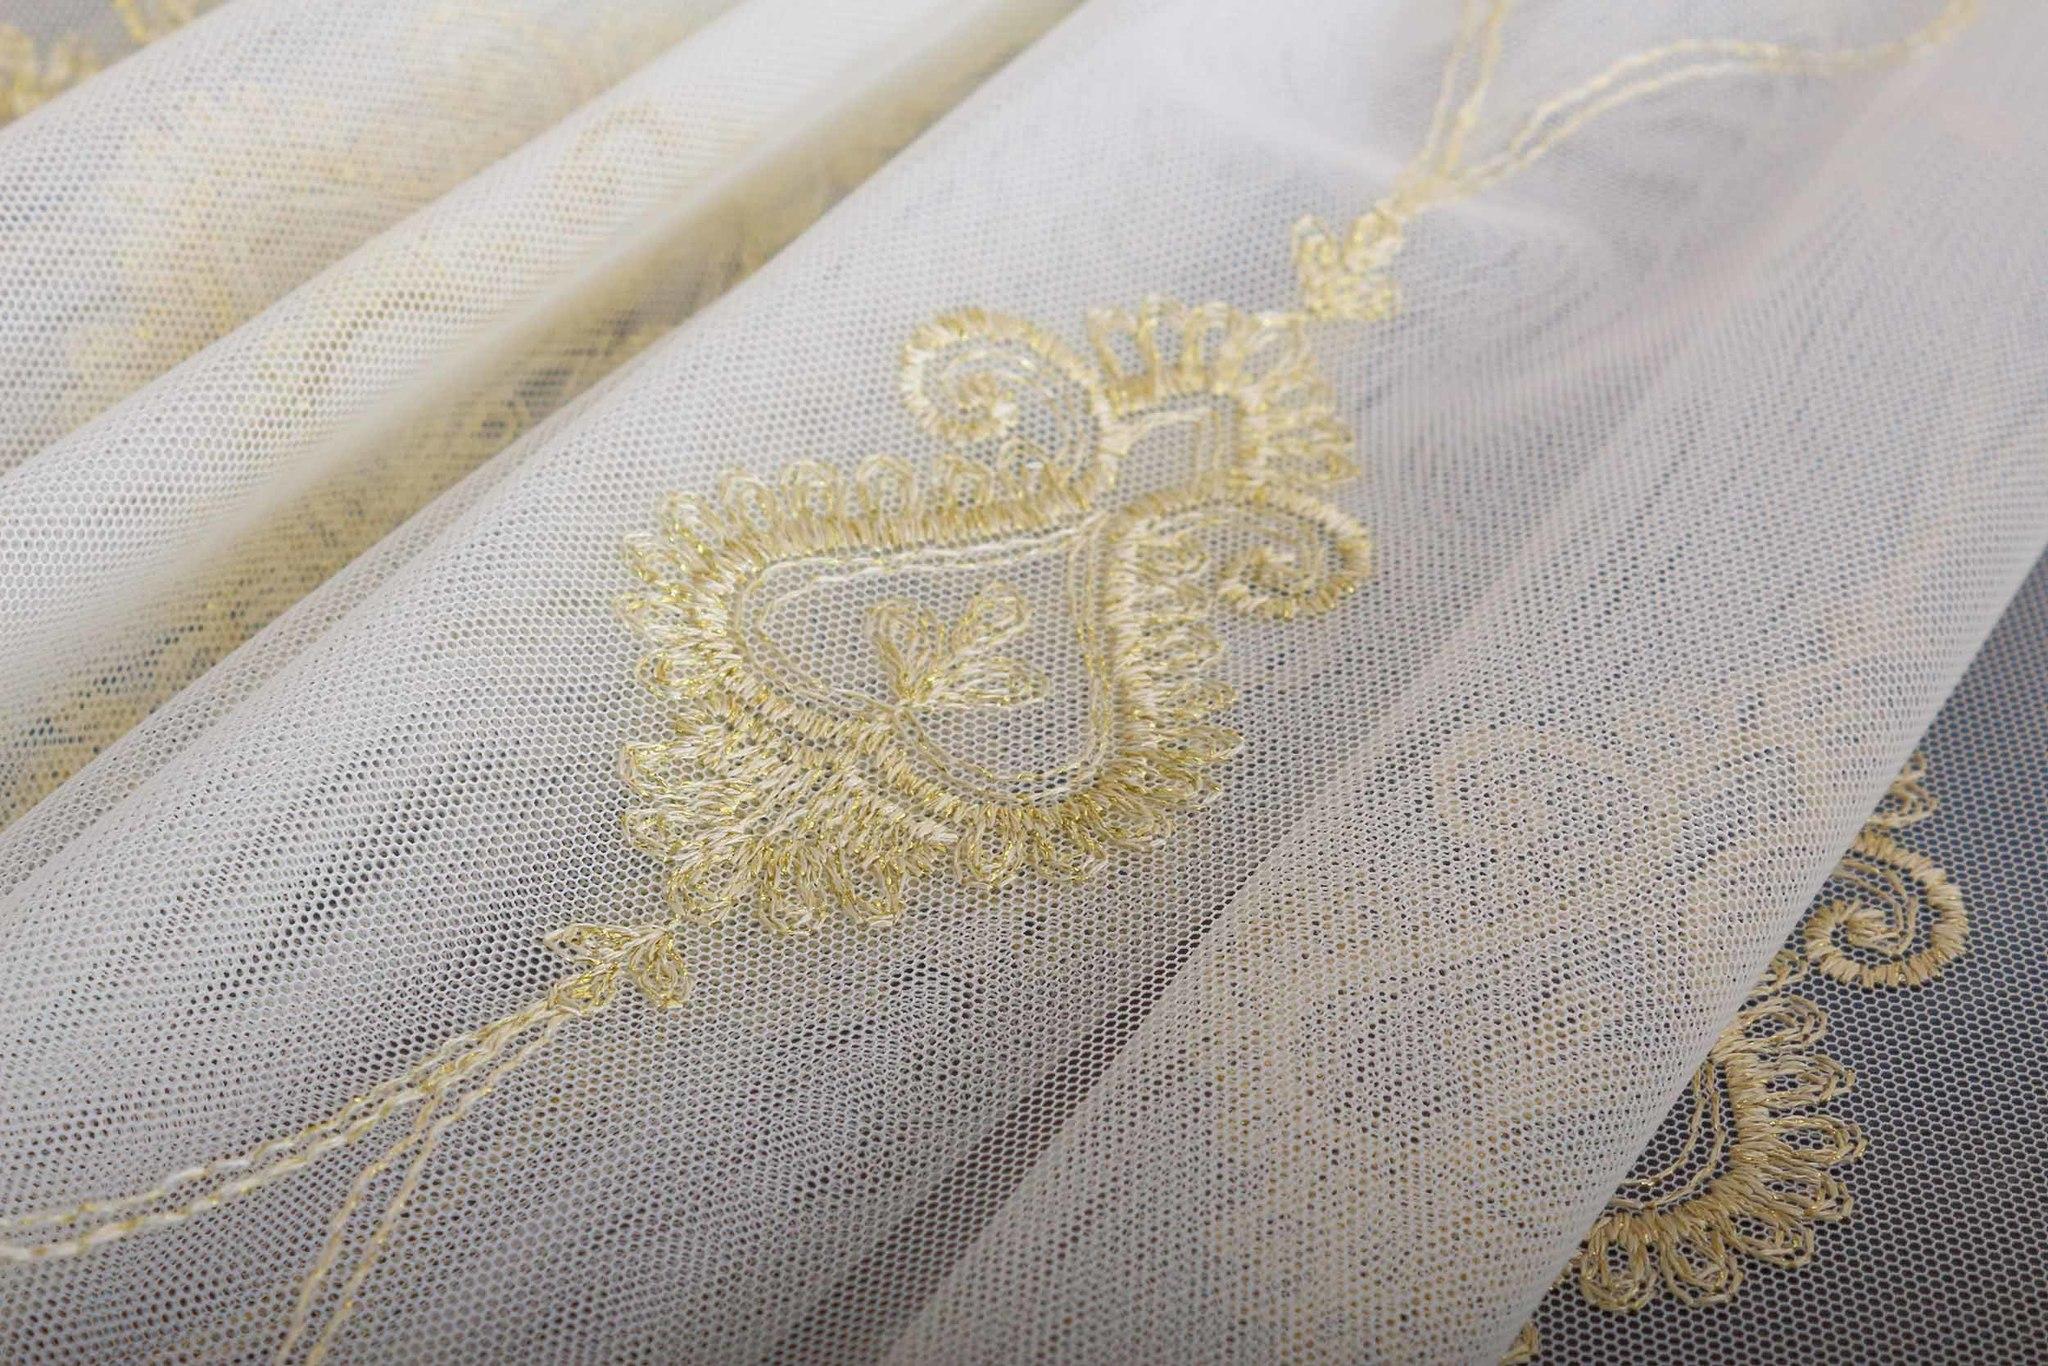 Микросетка с вышивкой Флоренция-2 (Золото)